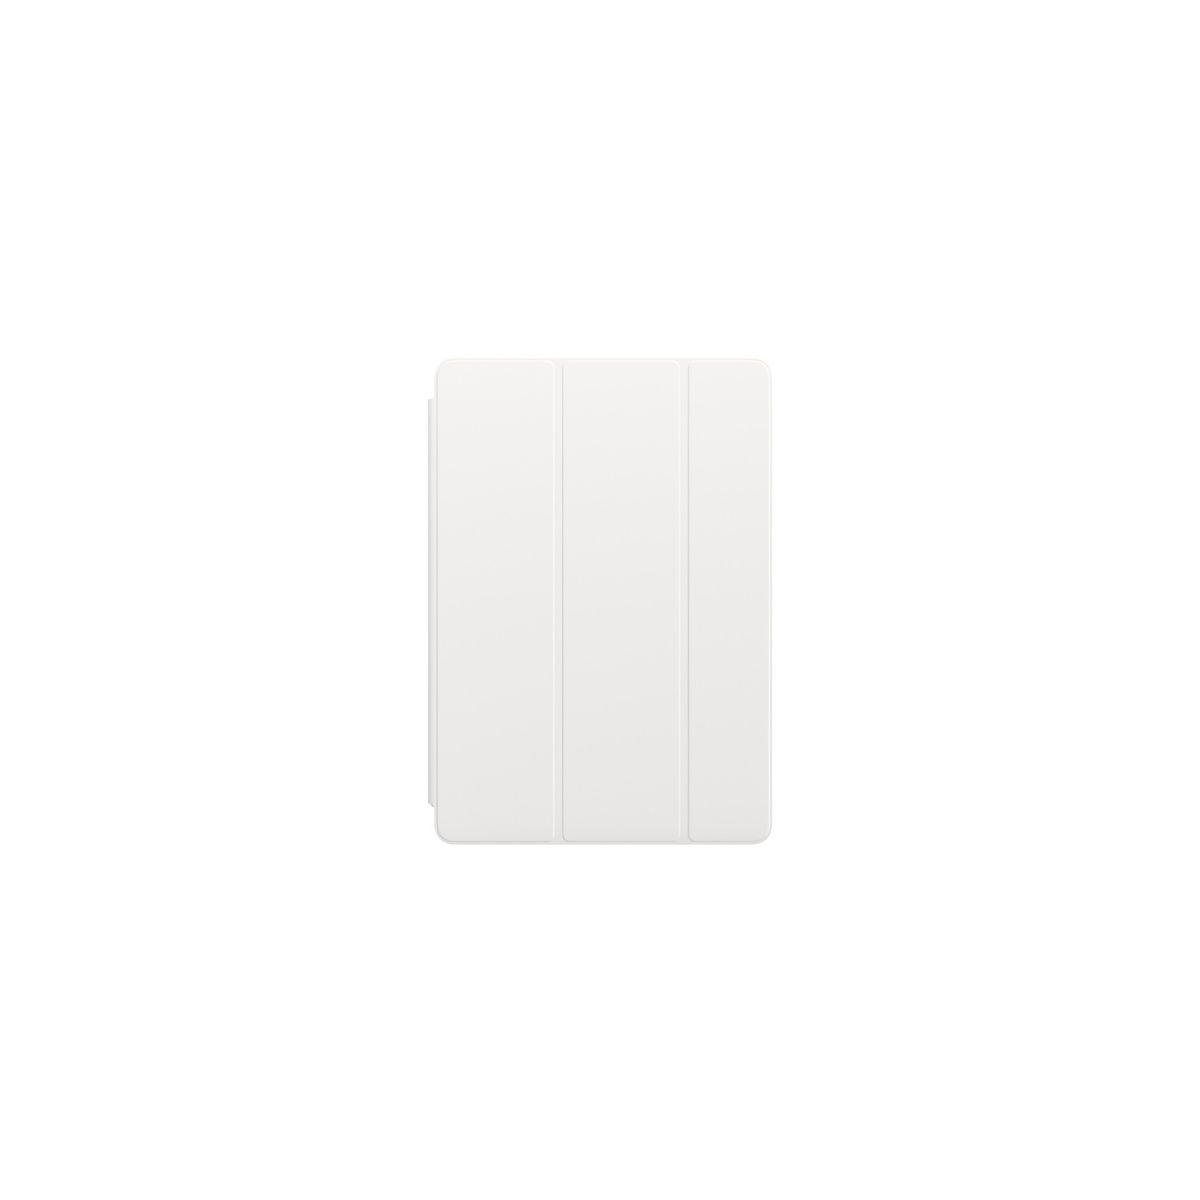 Etui tablette apple smart cover ipad pro 10.5 blanc - livraison offerte : code liv (photo)